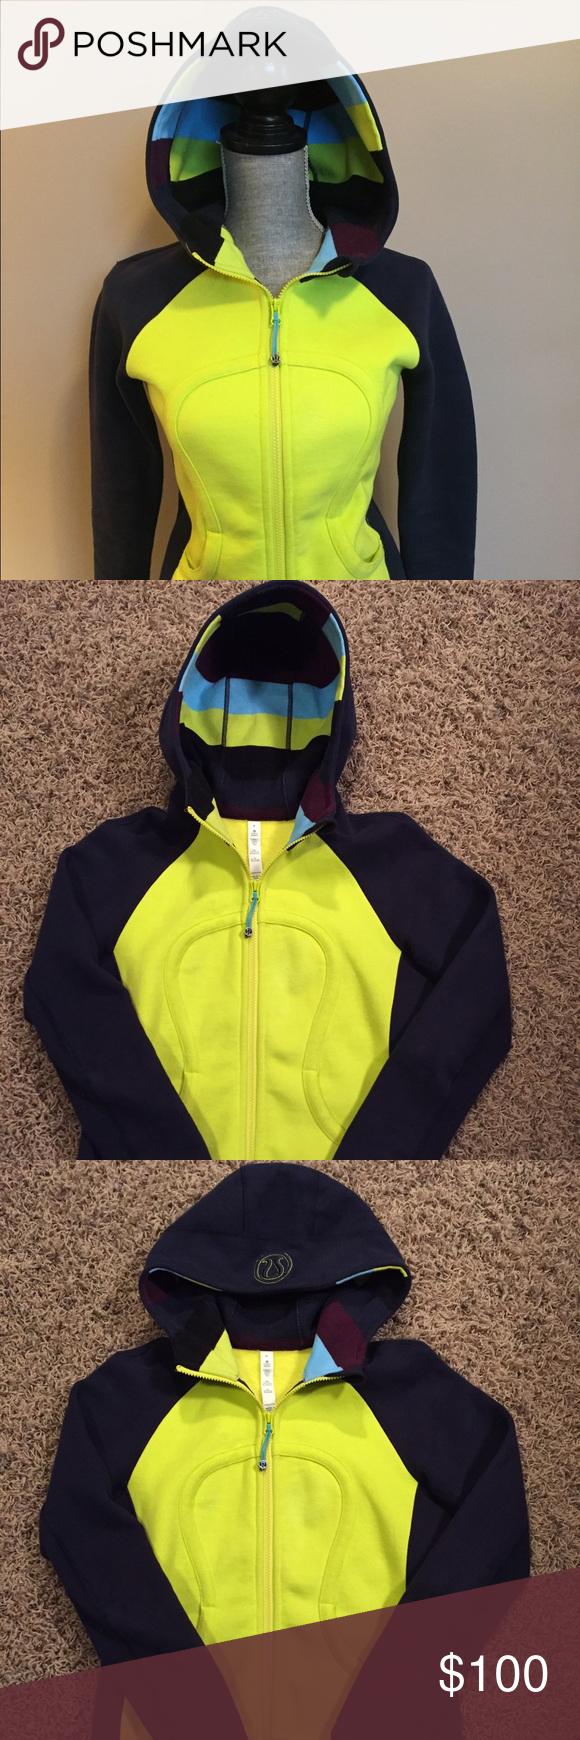 Rare lululemon scuba hoodie size 6 EUC - worn twice. Rip tag intact. Rare. lululemon athletica Tops Sweatshirts & Hoodies